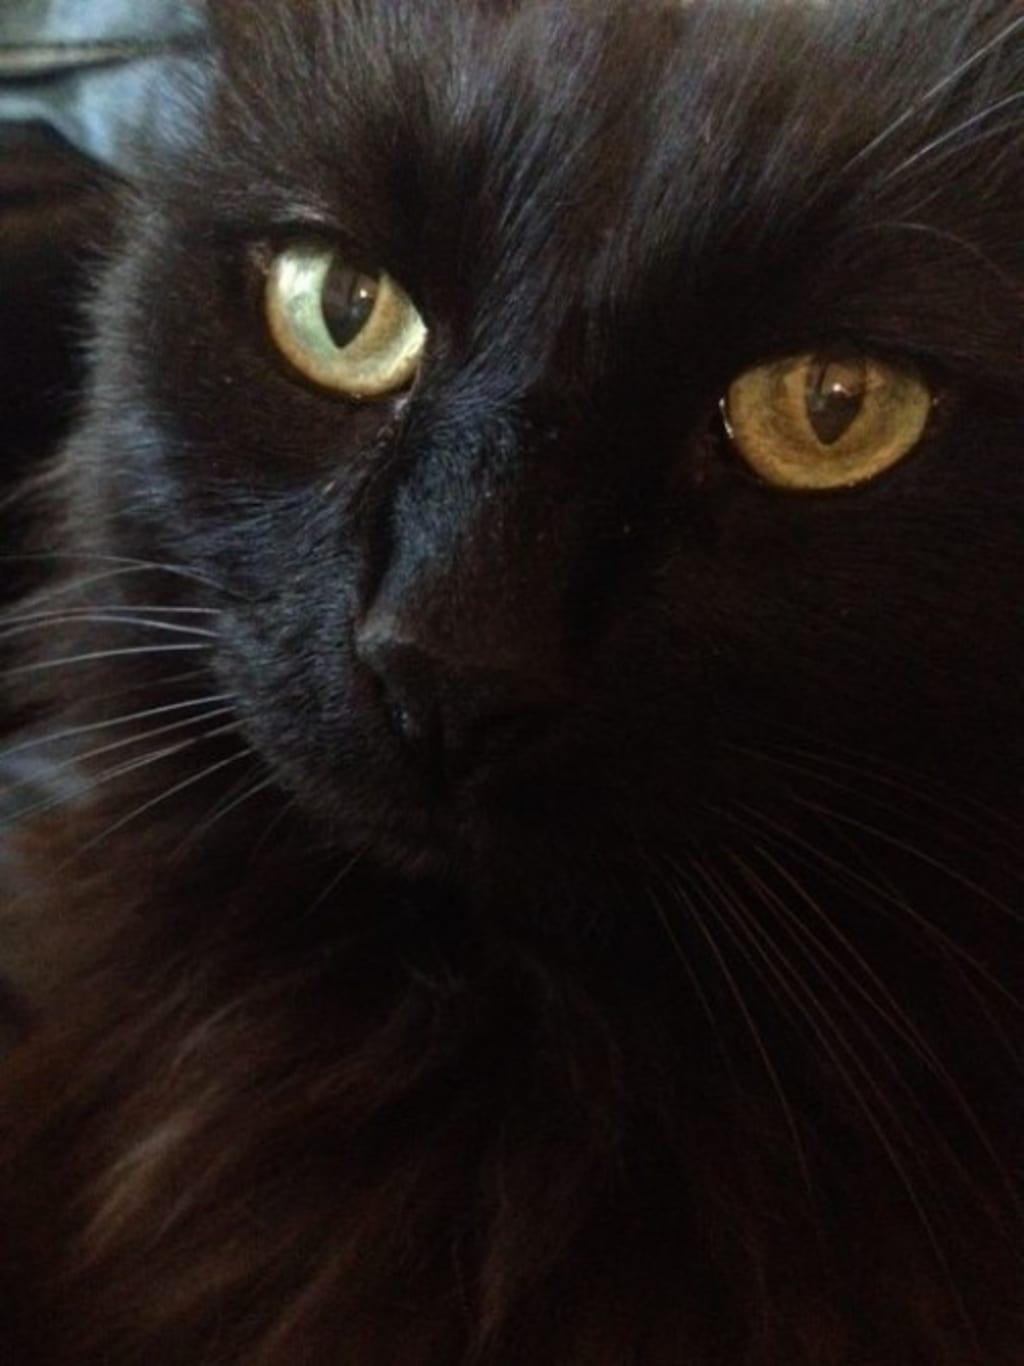 Black Night, Black Cat